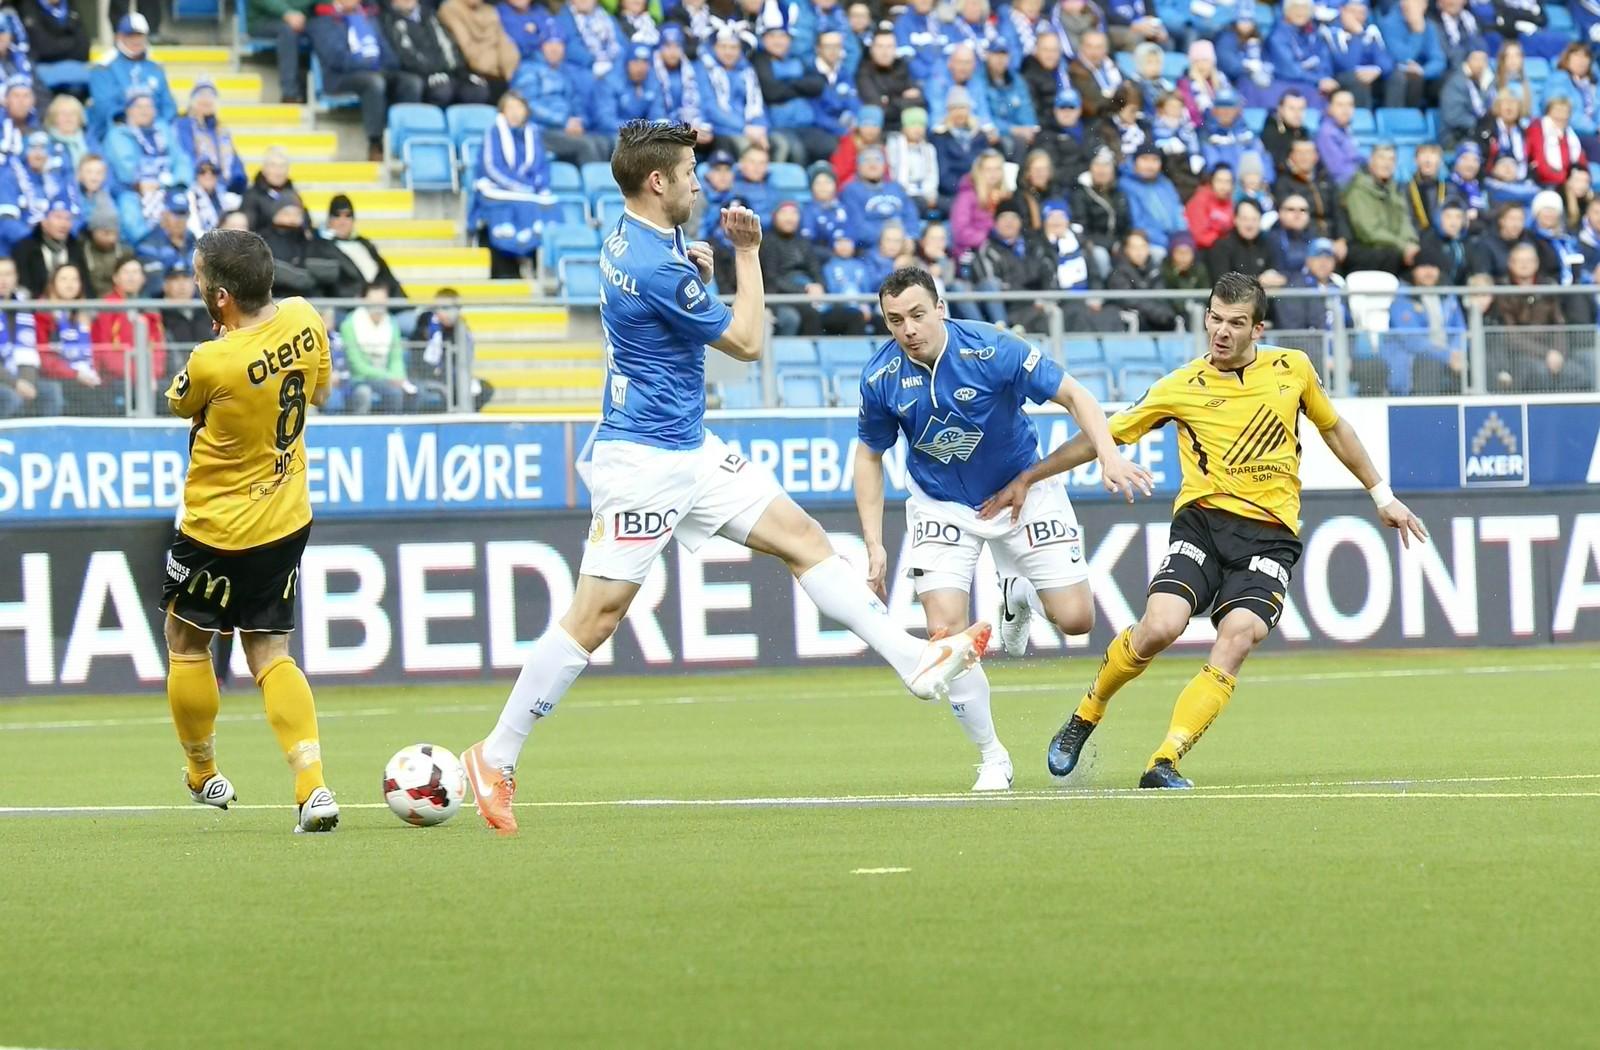 Tripic i duell med gamle lagkameratar i Molde på Aker stadion.